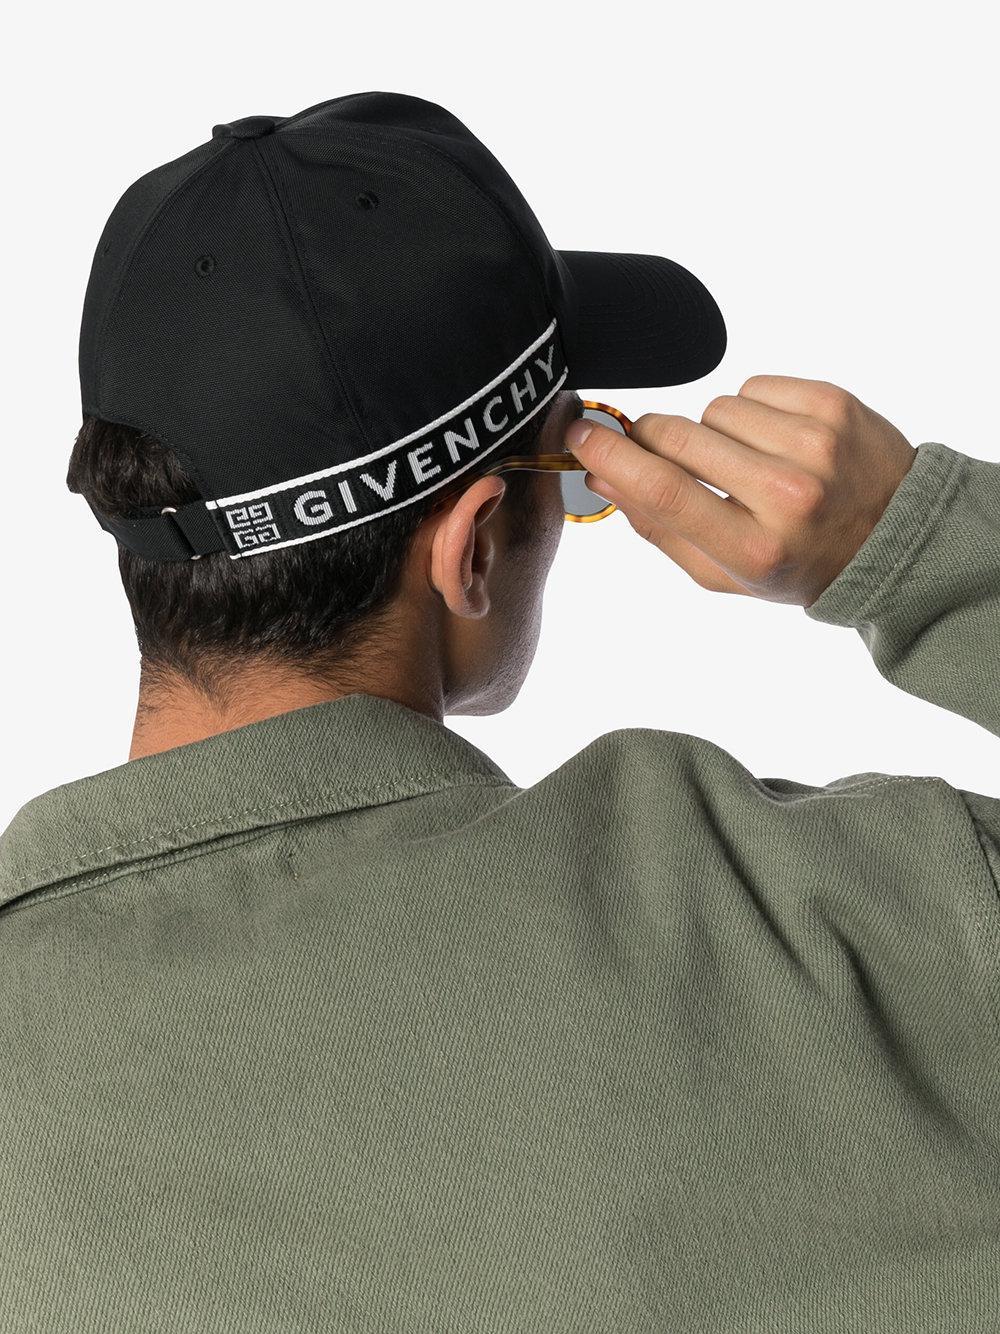 19a718839df Givenchy - Black And White 4g Logo Baseball Cap for Men - Lyst. View  fullscreen